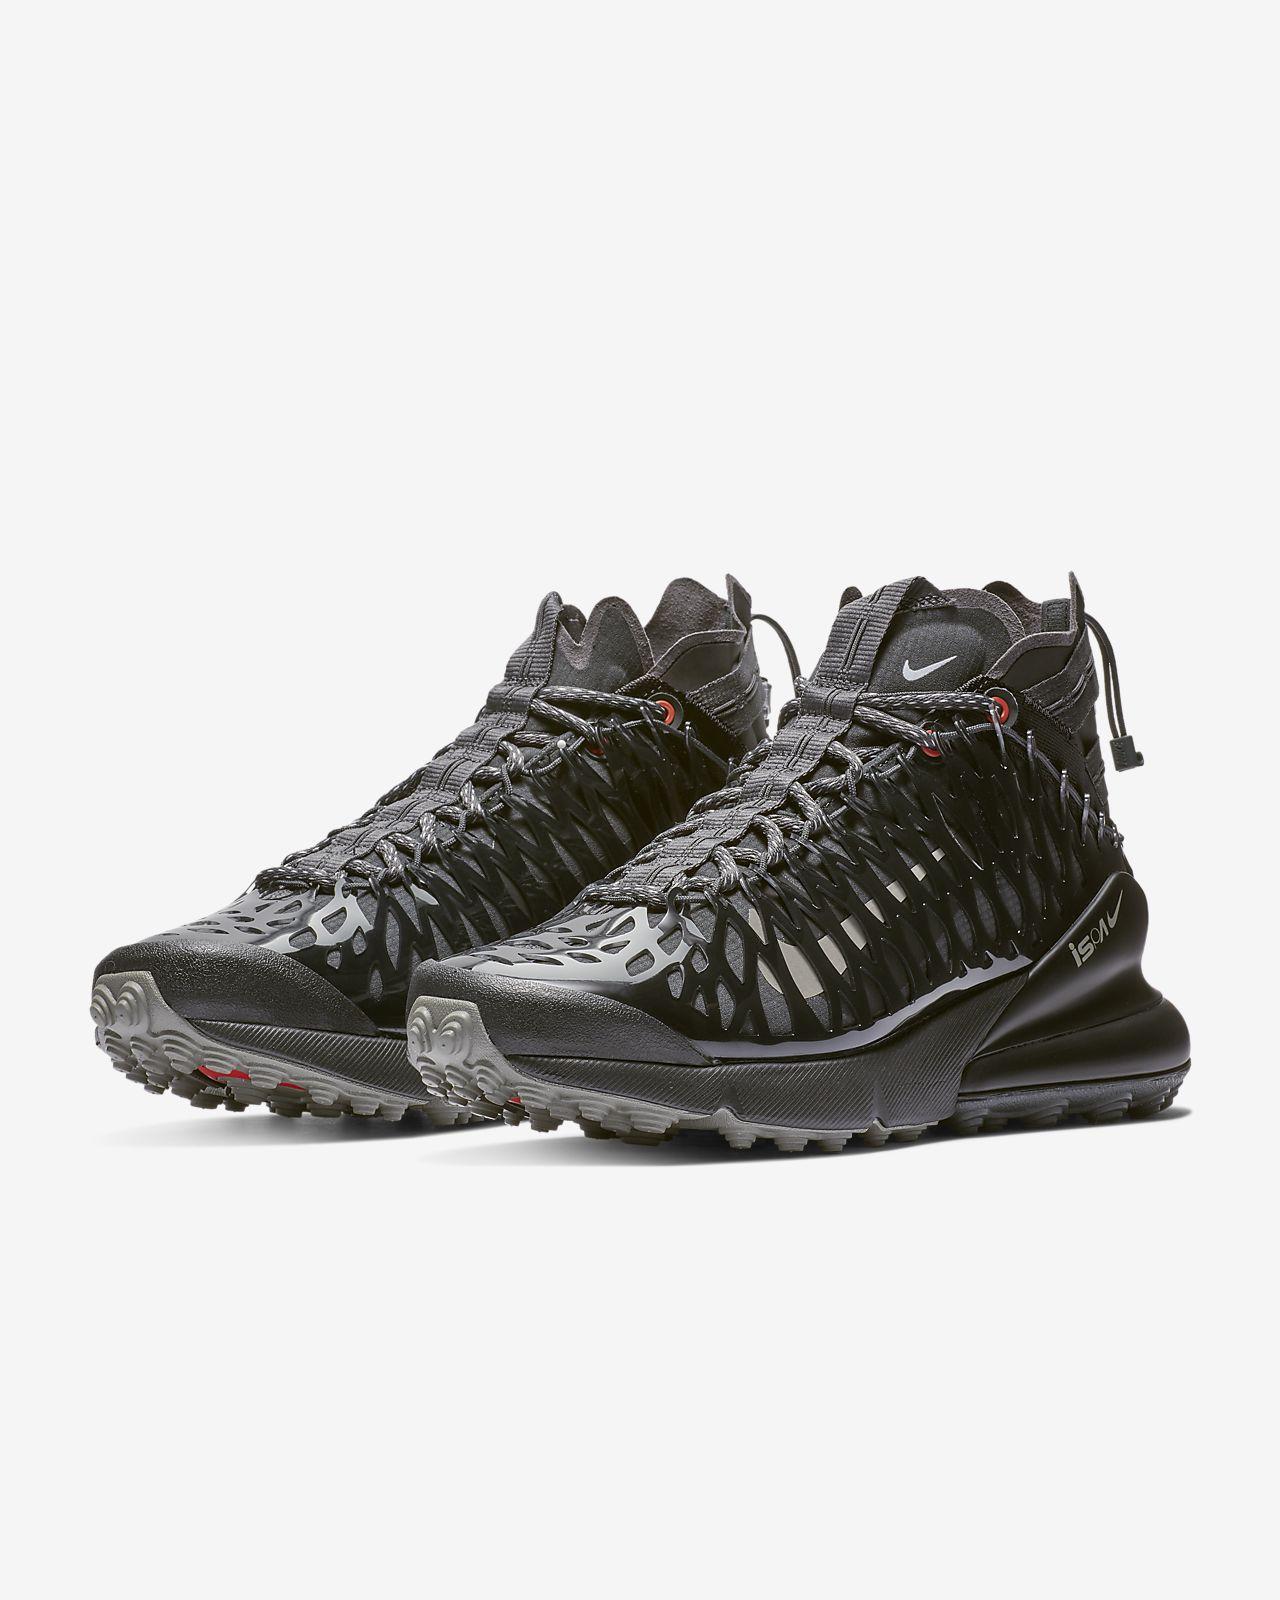 69de6942ec757 Scarpa Nike Air Max 270 ISPA - Uomo. Nike.com IT